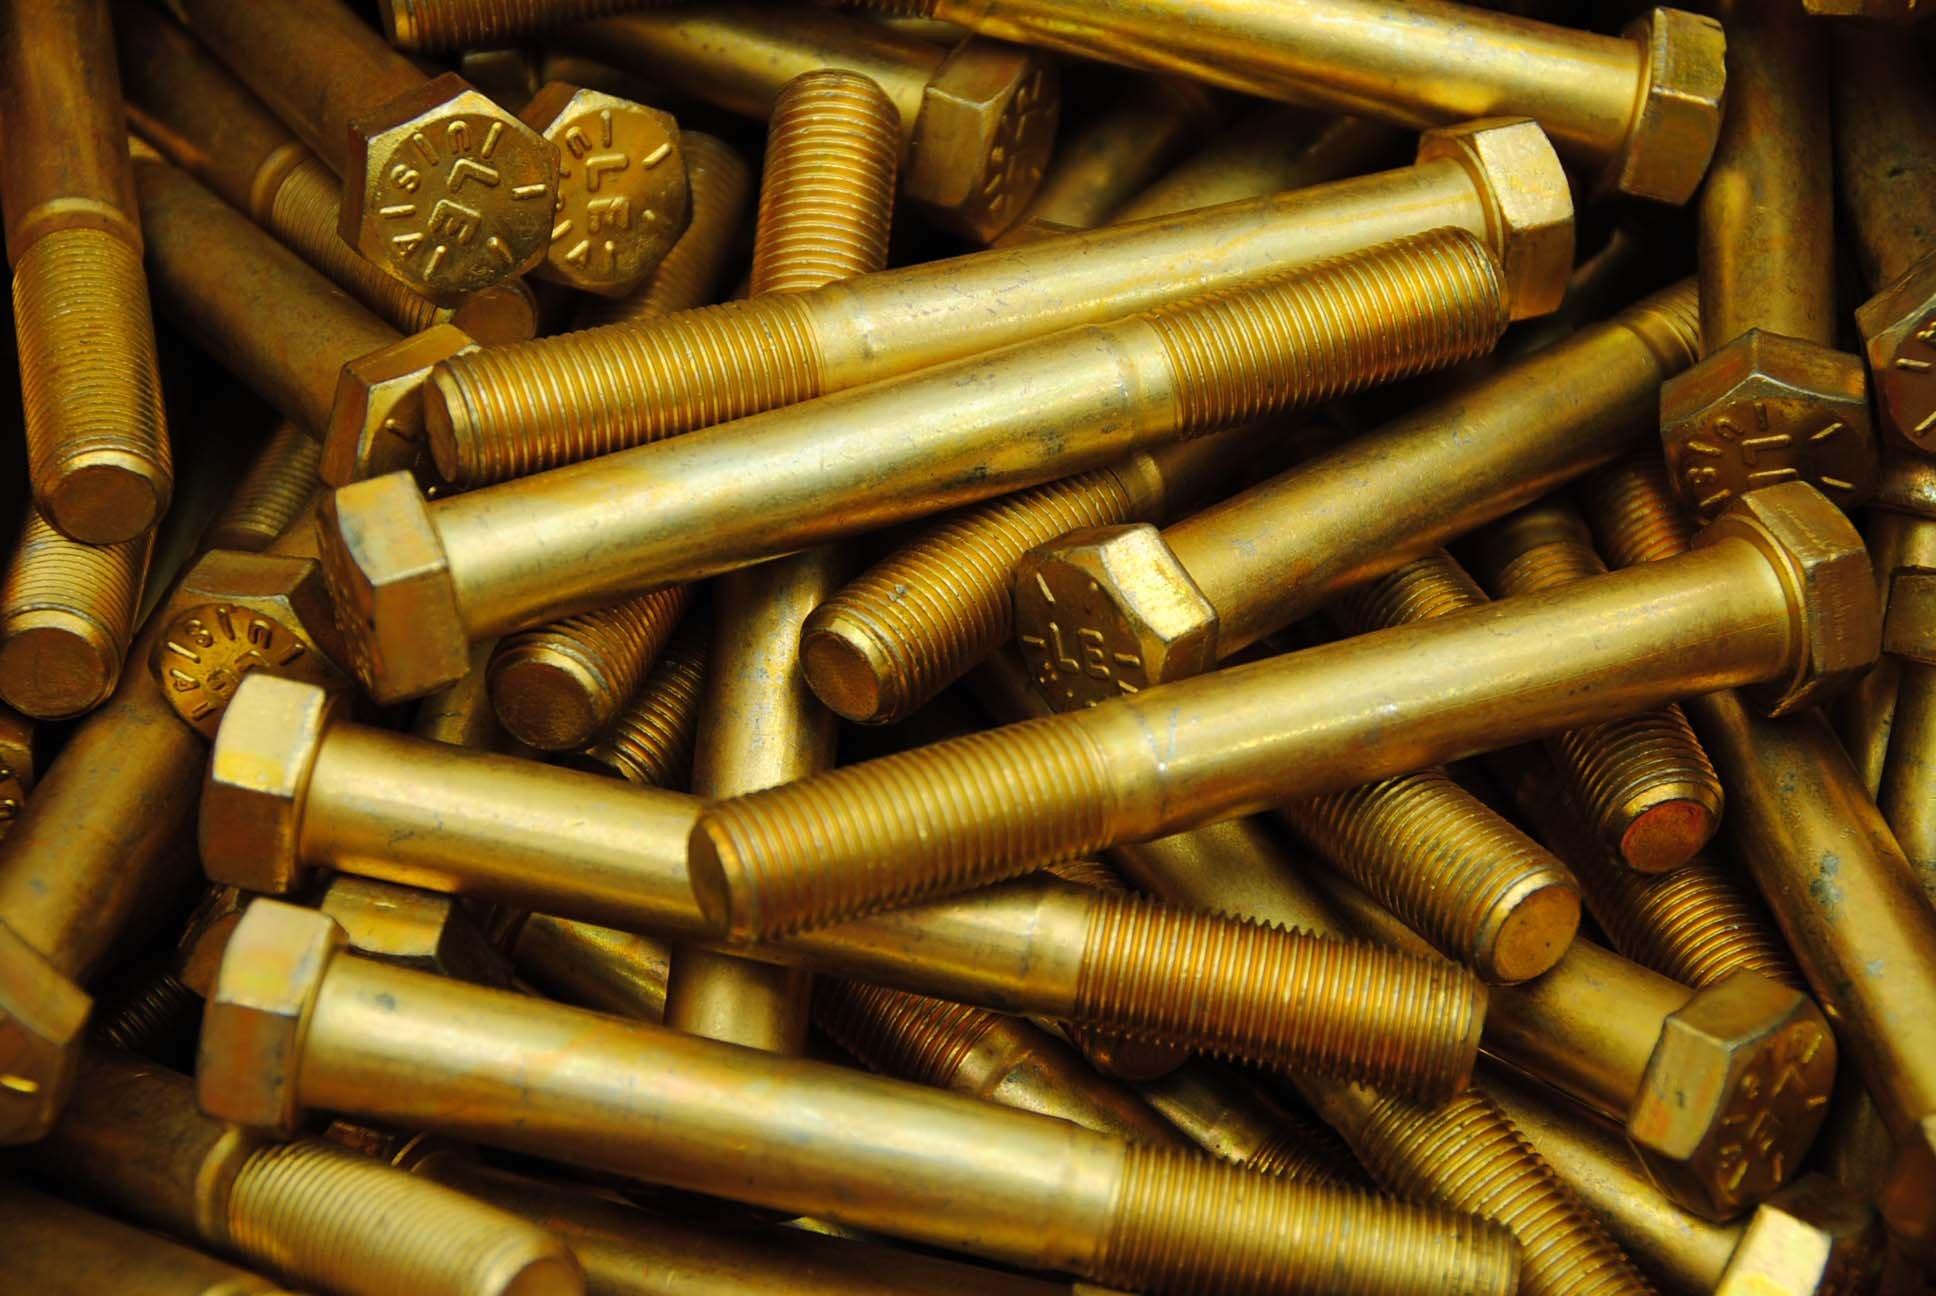 (15) Hex Head Bolts 9/16-18 x 4-1/2 Grade 8 Fine Thread Yellow Zinc USA Made by Lexar Industrial